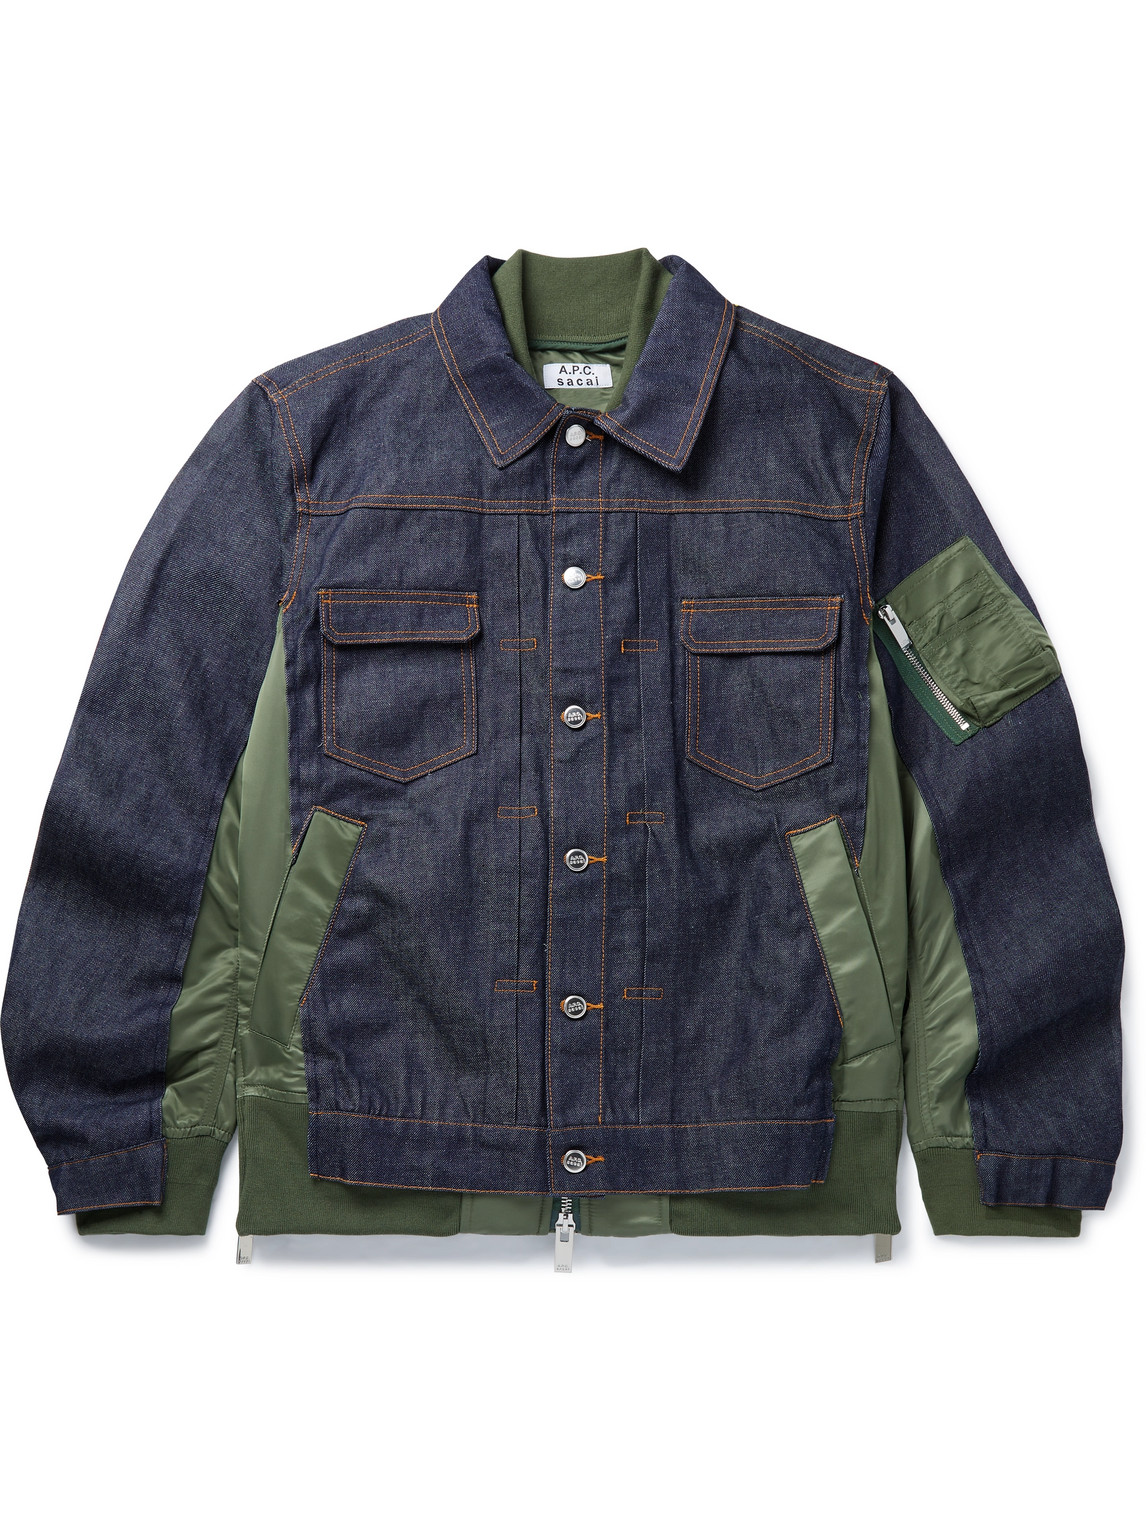 A.p.c. Sacai Oversized Nylon-panelled Denim Jacket In Green